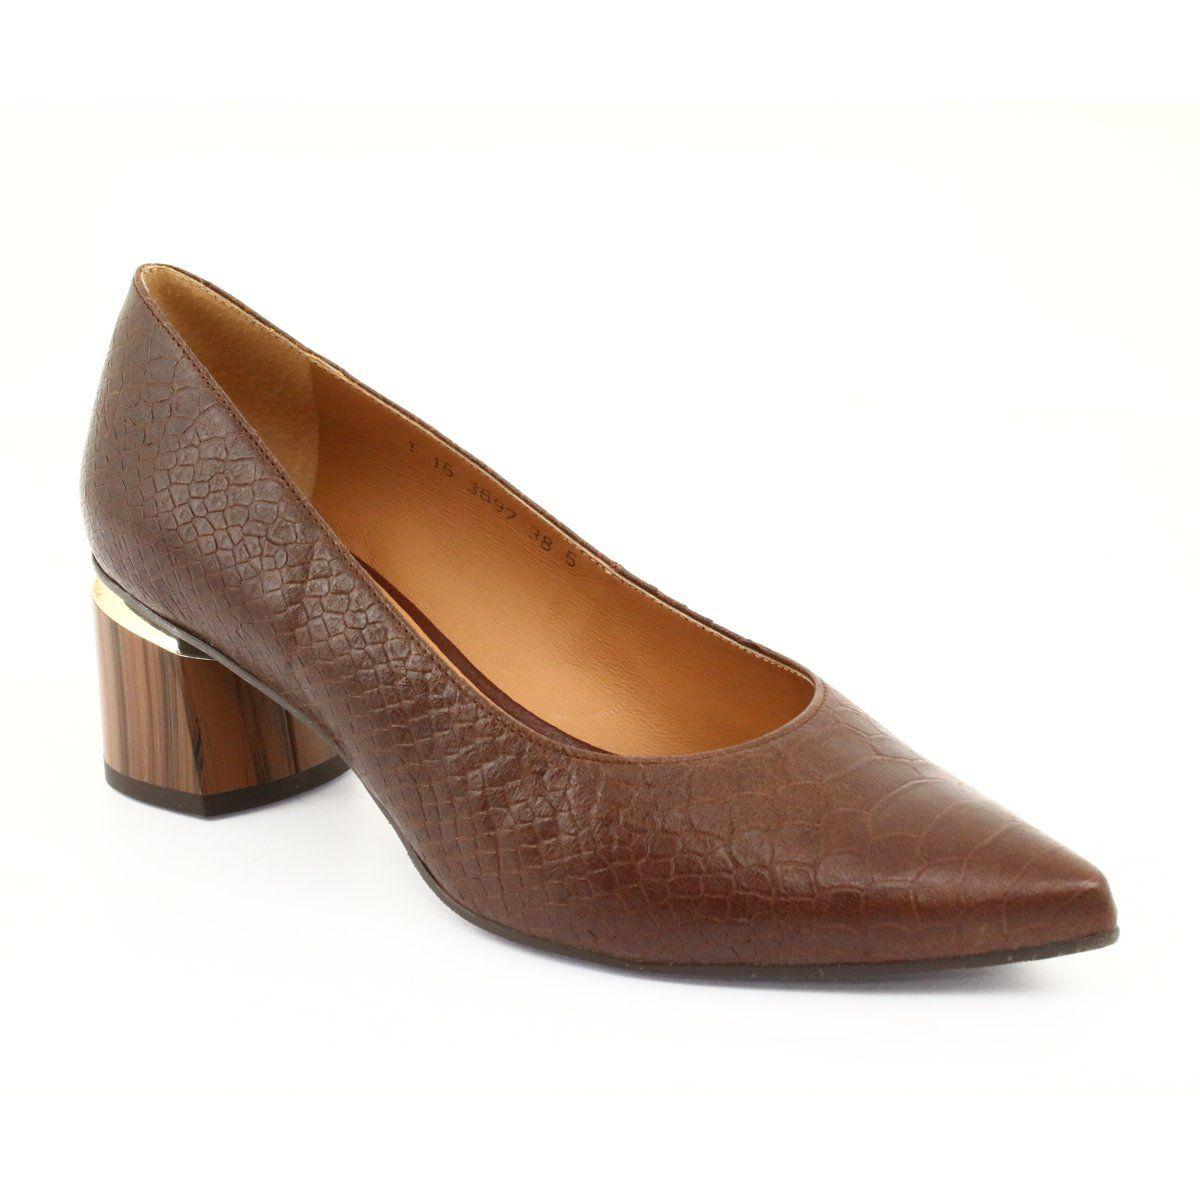 Czolenka Buty Damskie Braz Pyton Anis 3697 Brazowe Women Shoes Shoes Shoes World